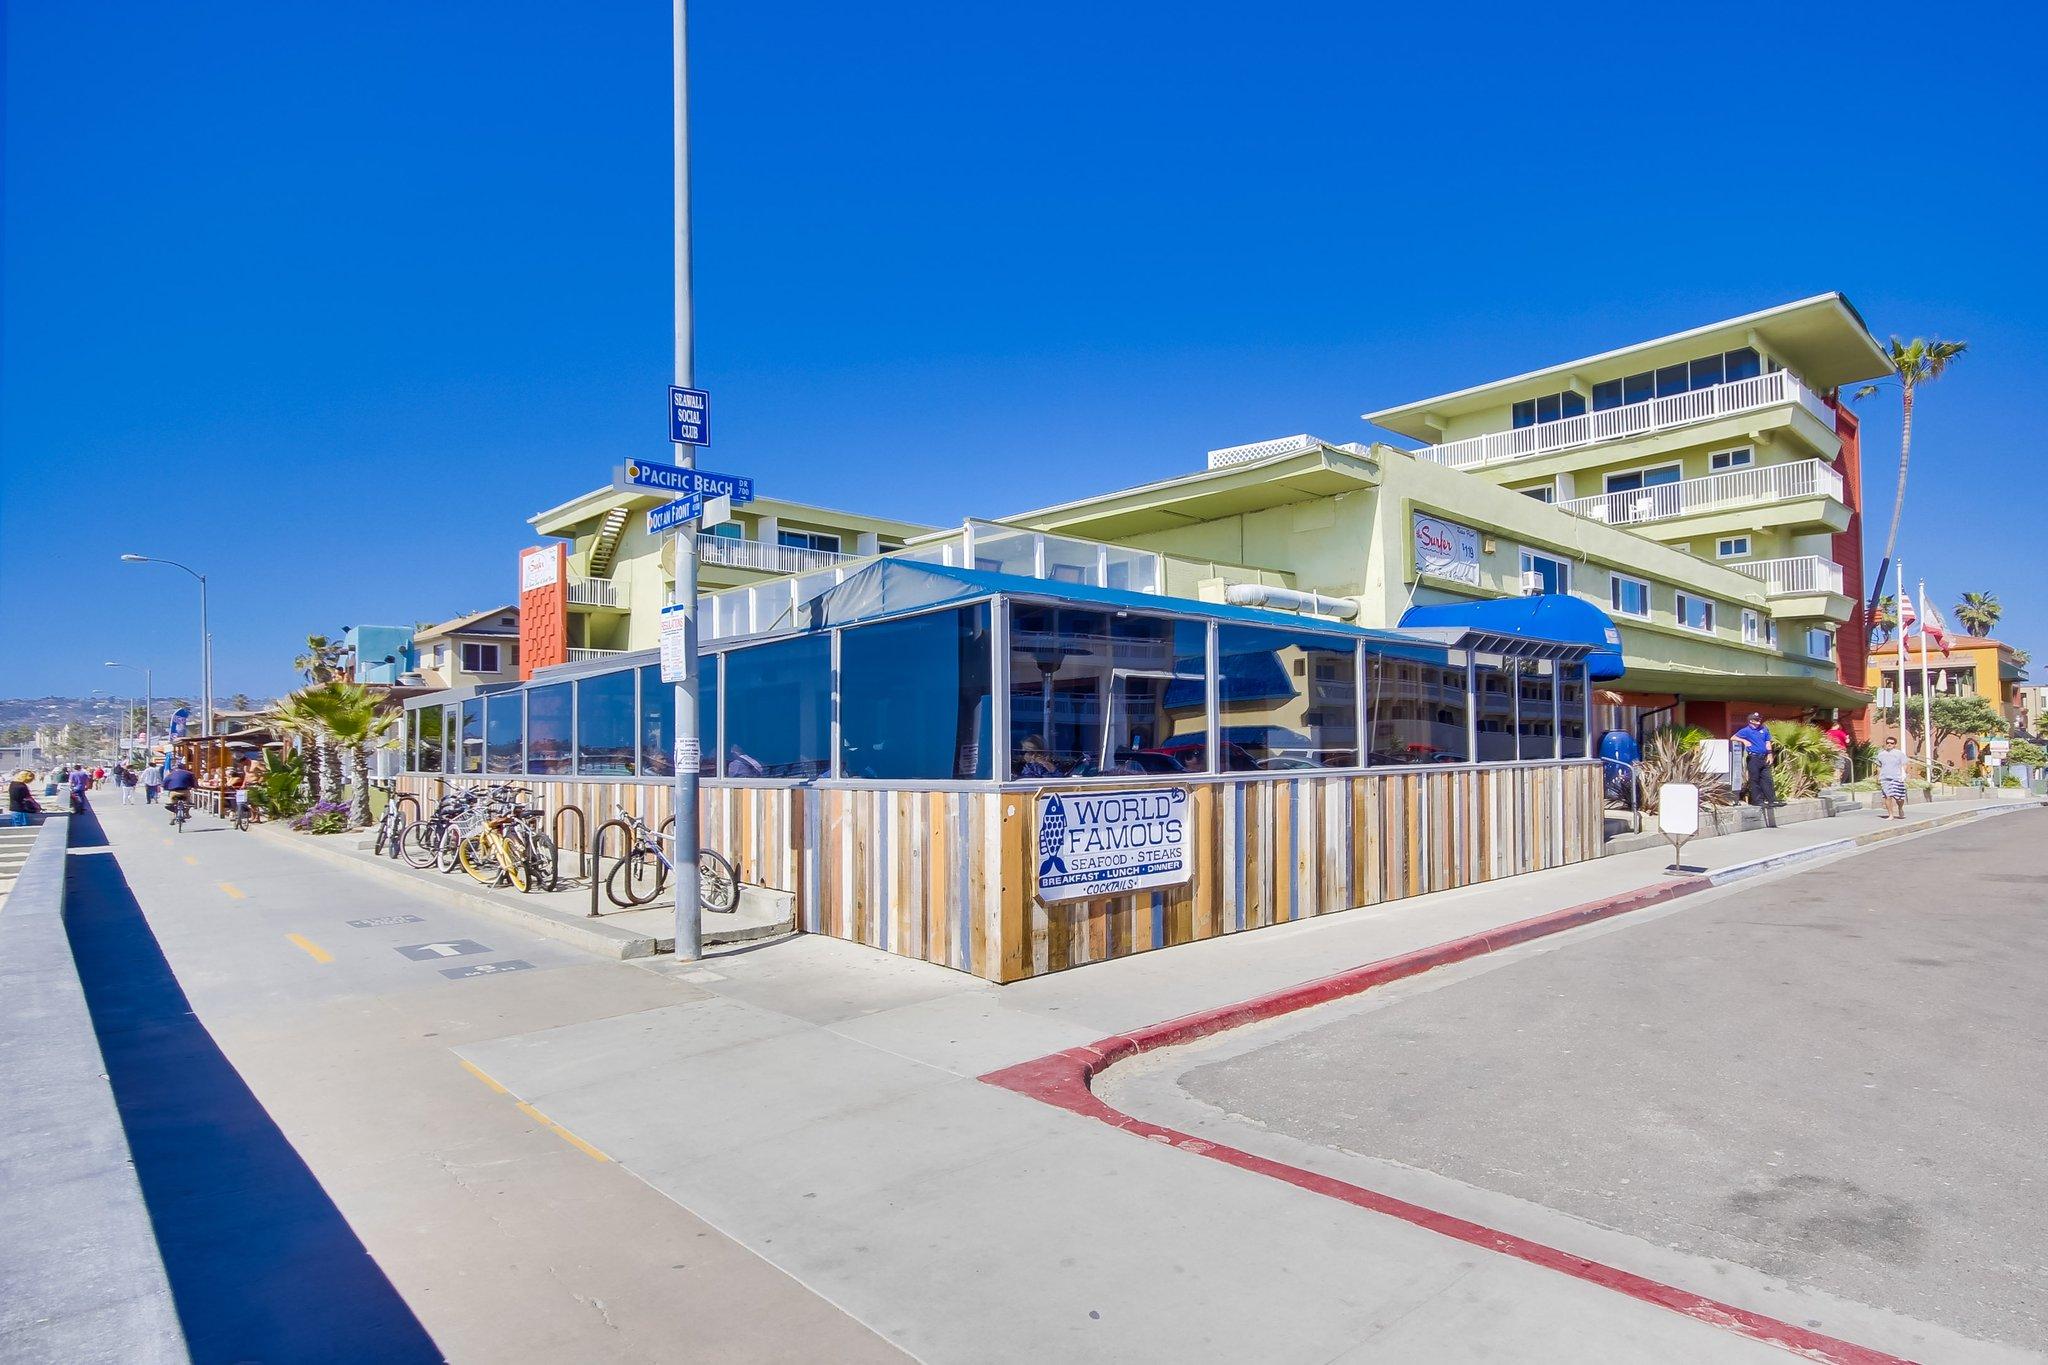 surfer beach hotel photos   missionbeachconcierge     web